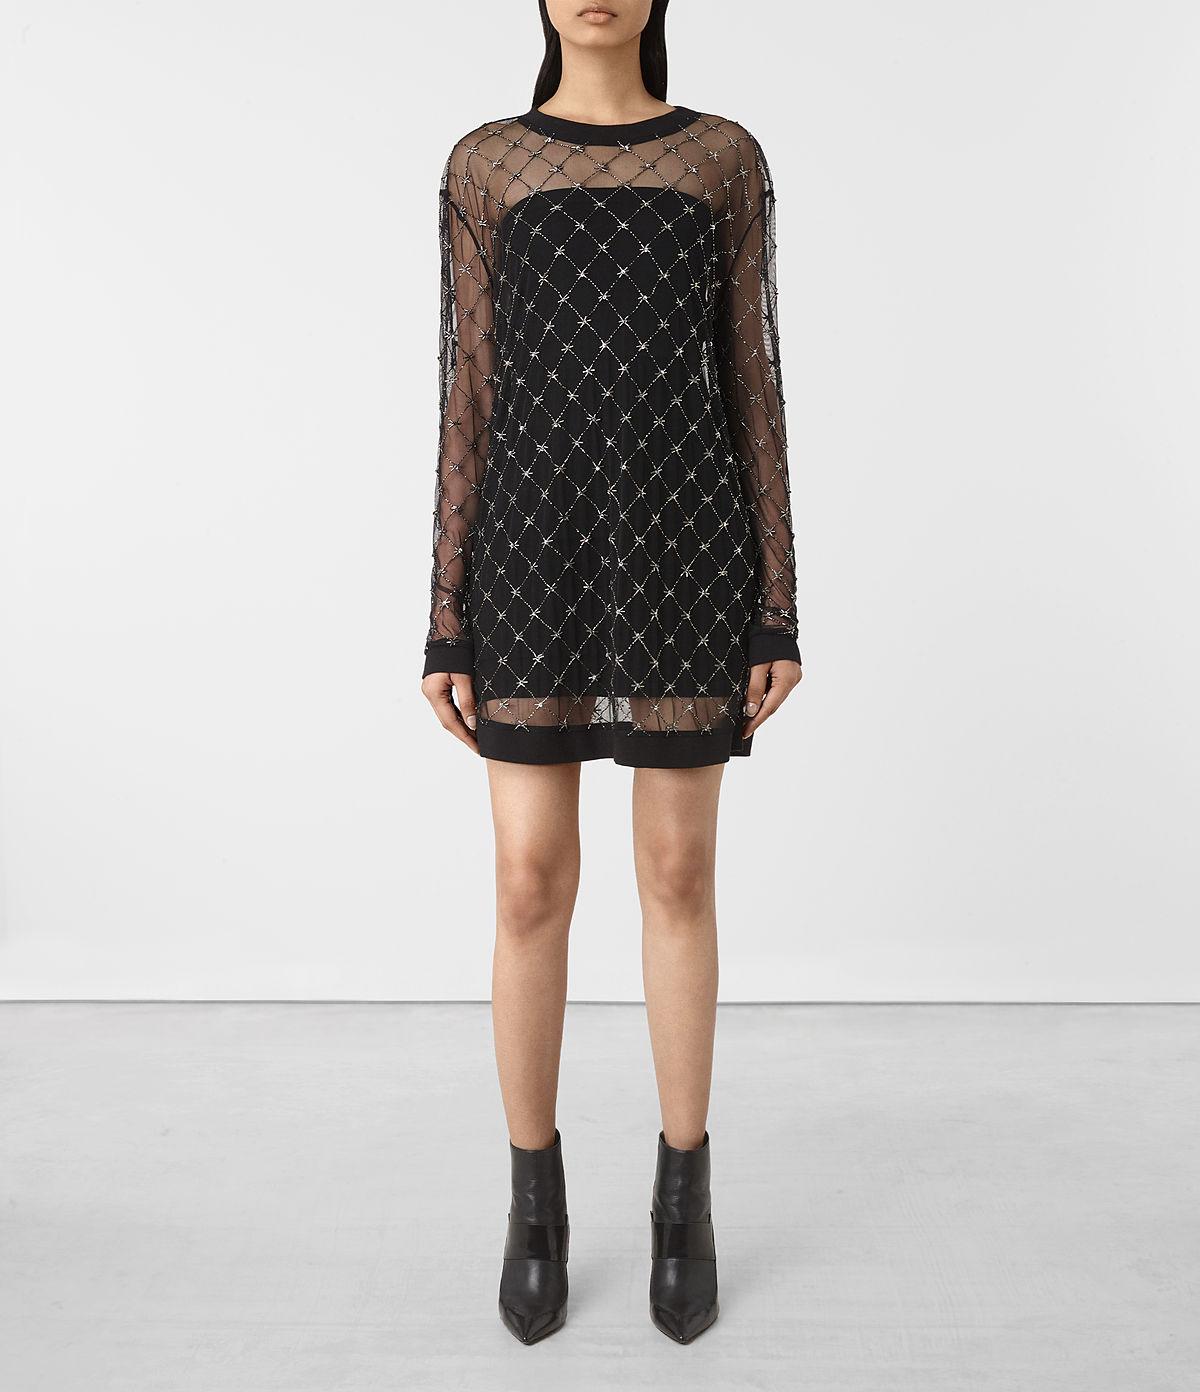 wire-embellished-dress